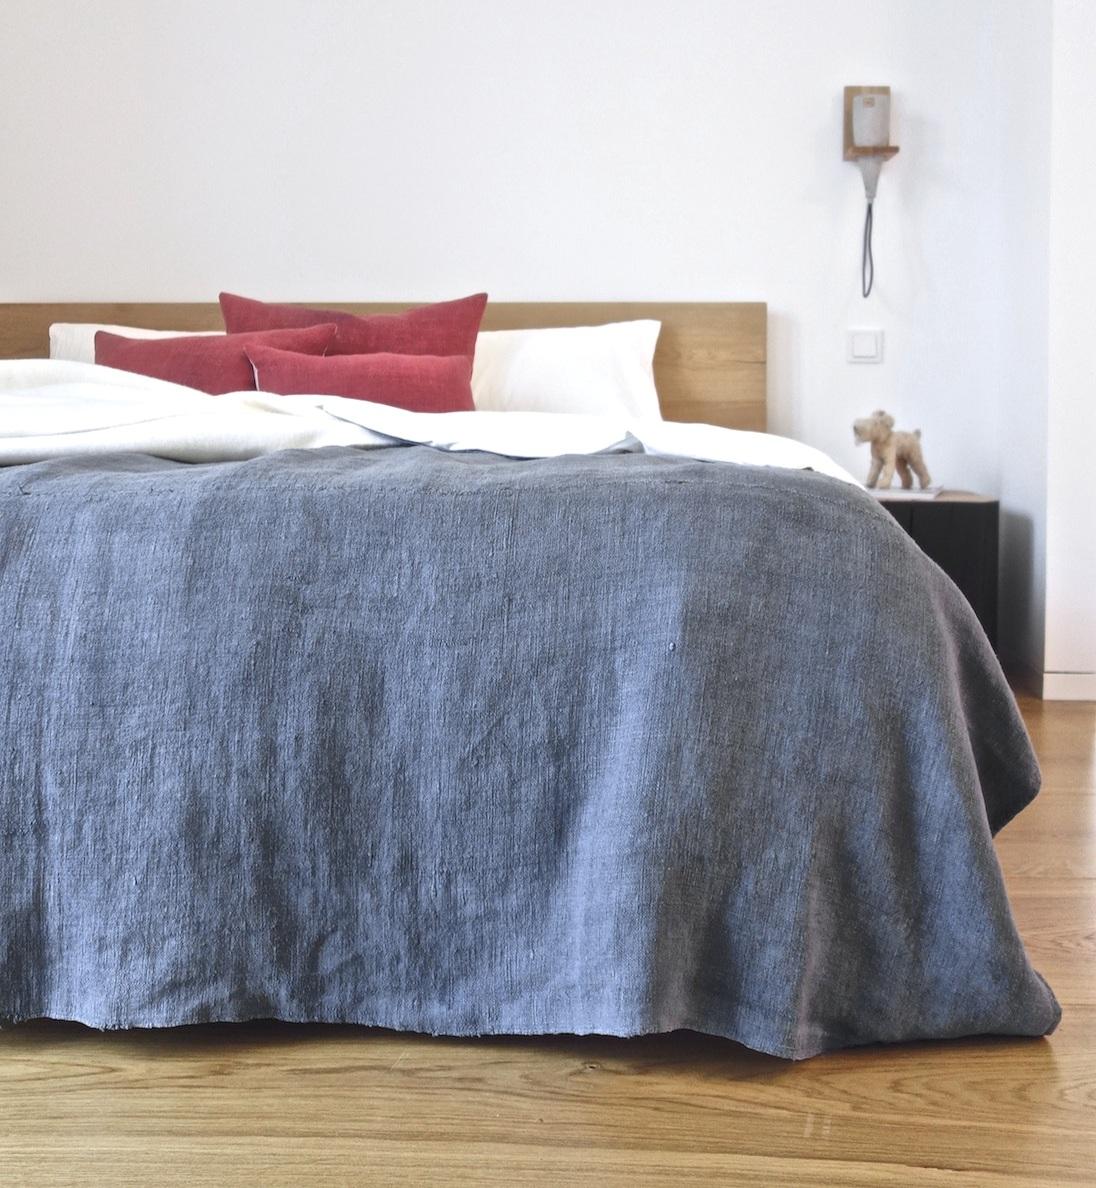 espanyolet_bedcover_coverlet_quilt_bedding_vintage.jpg